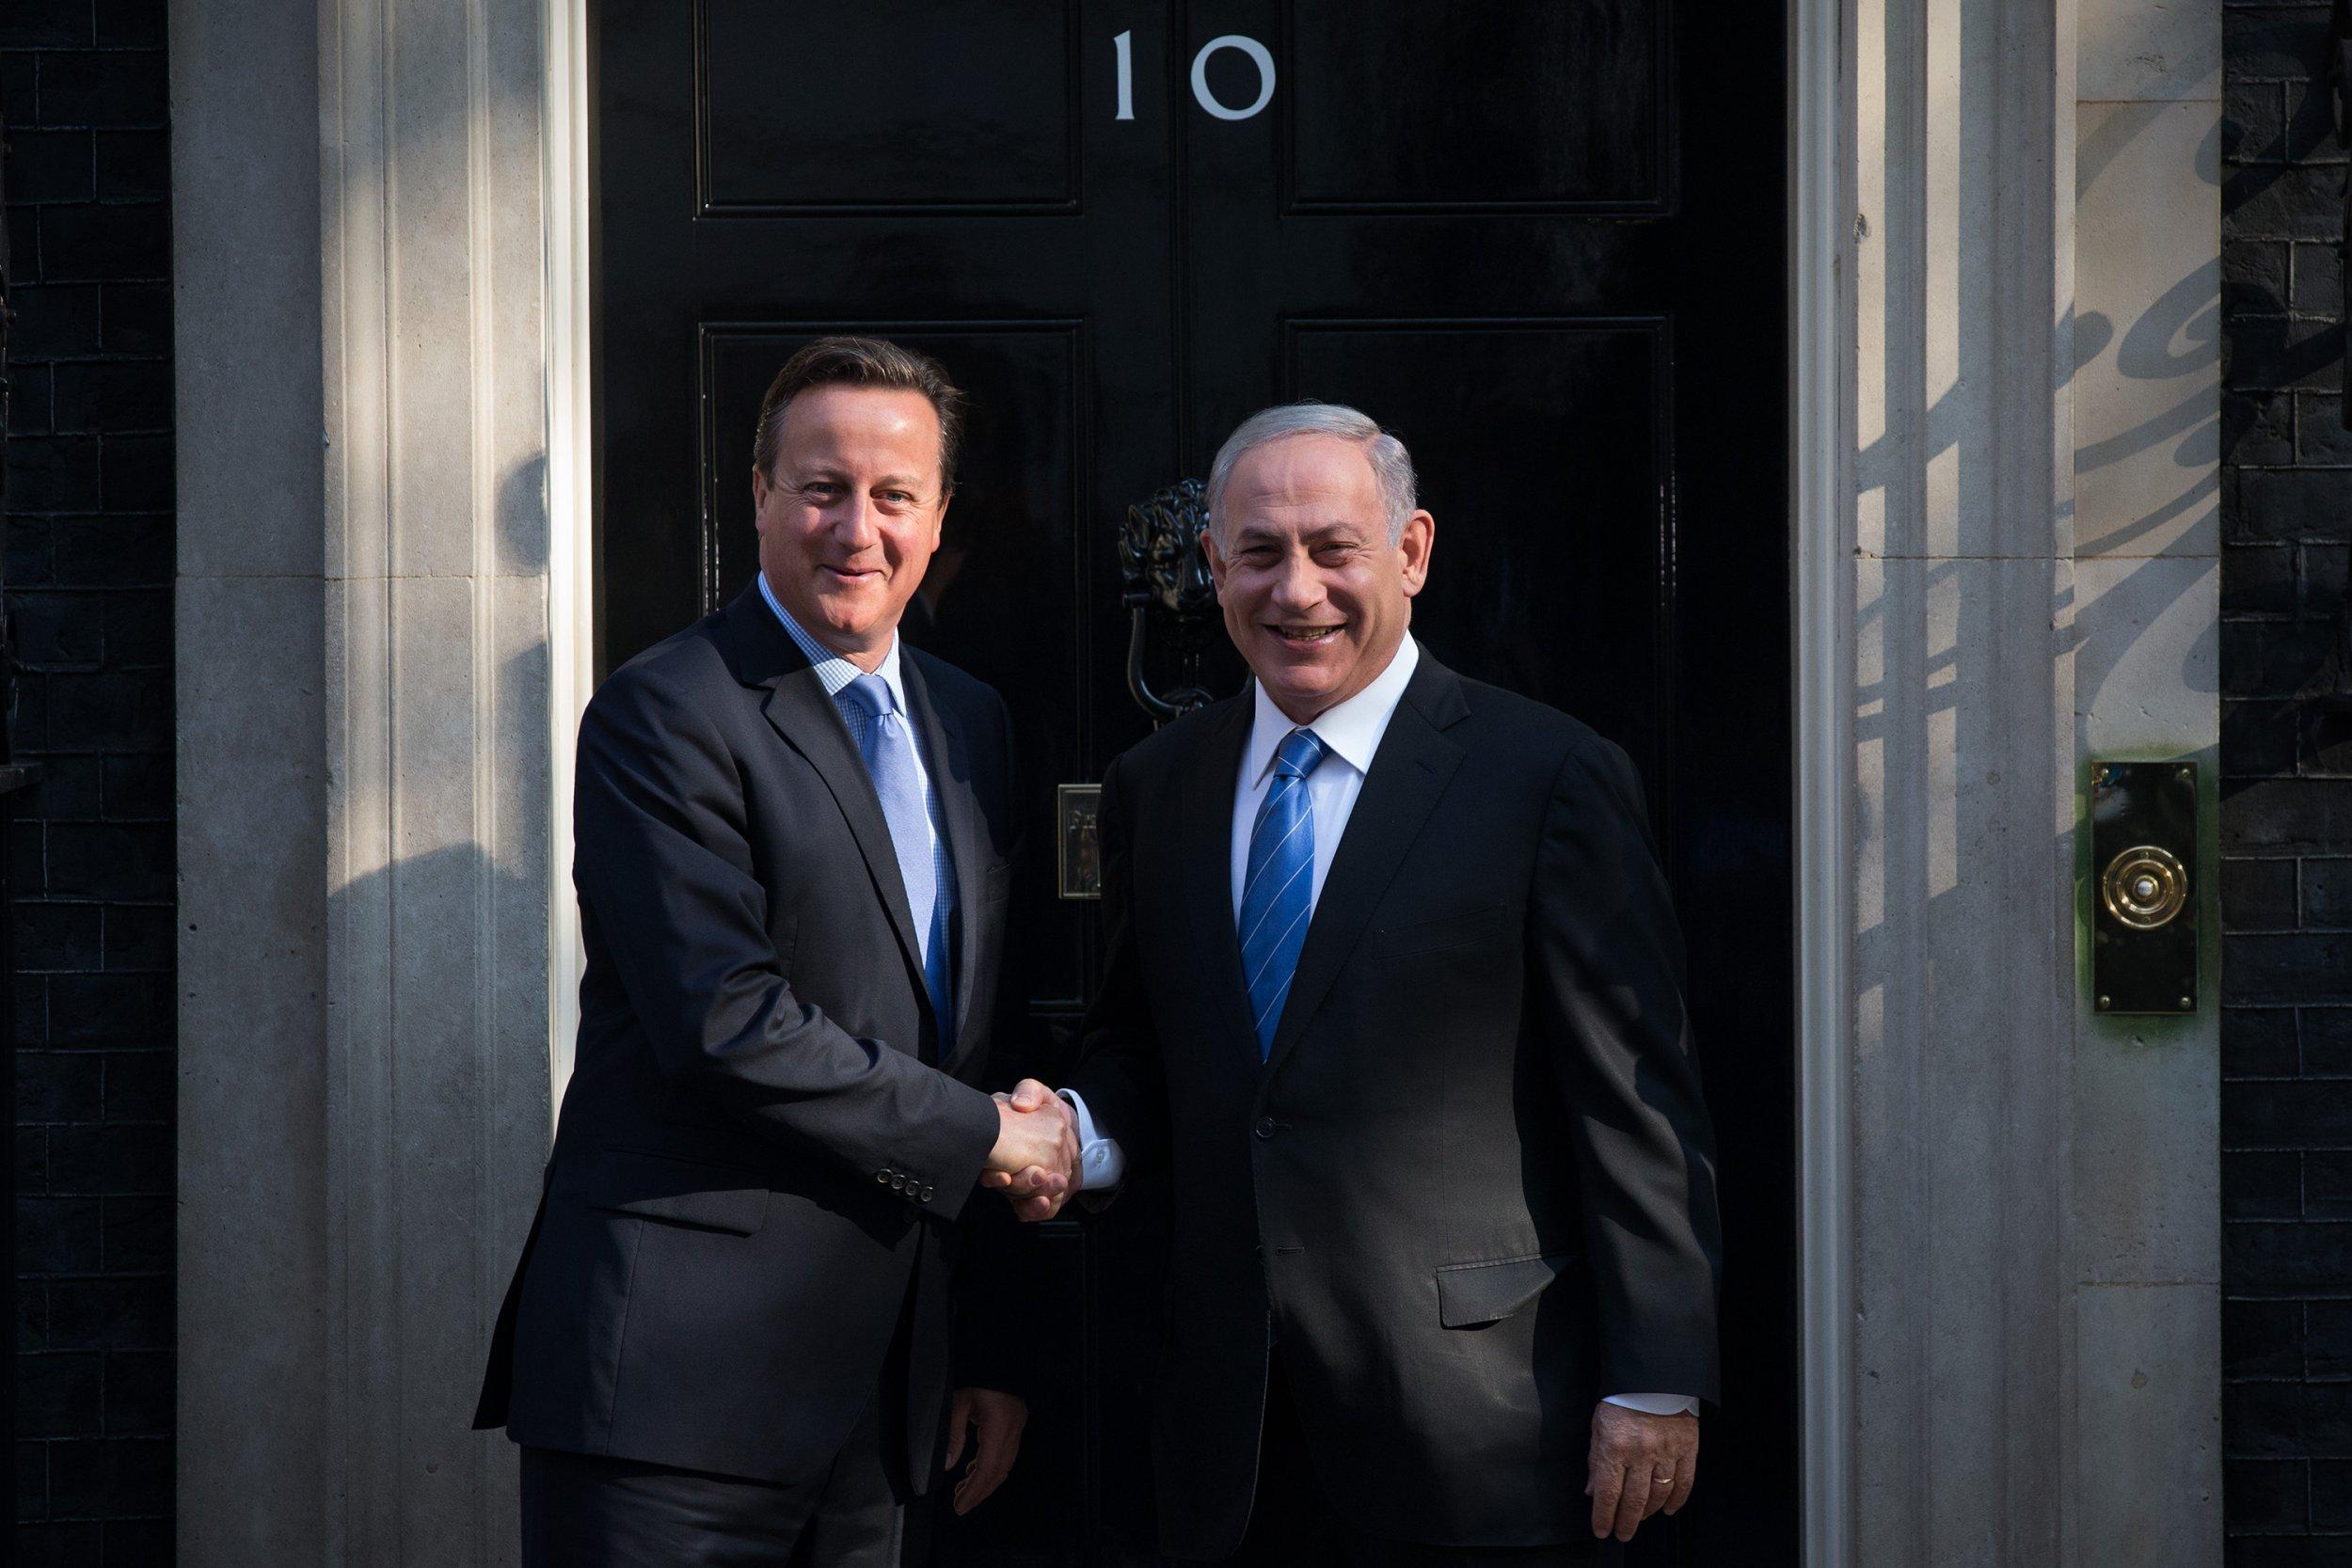 David Cameron and Benjamin Netanyahu